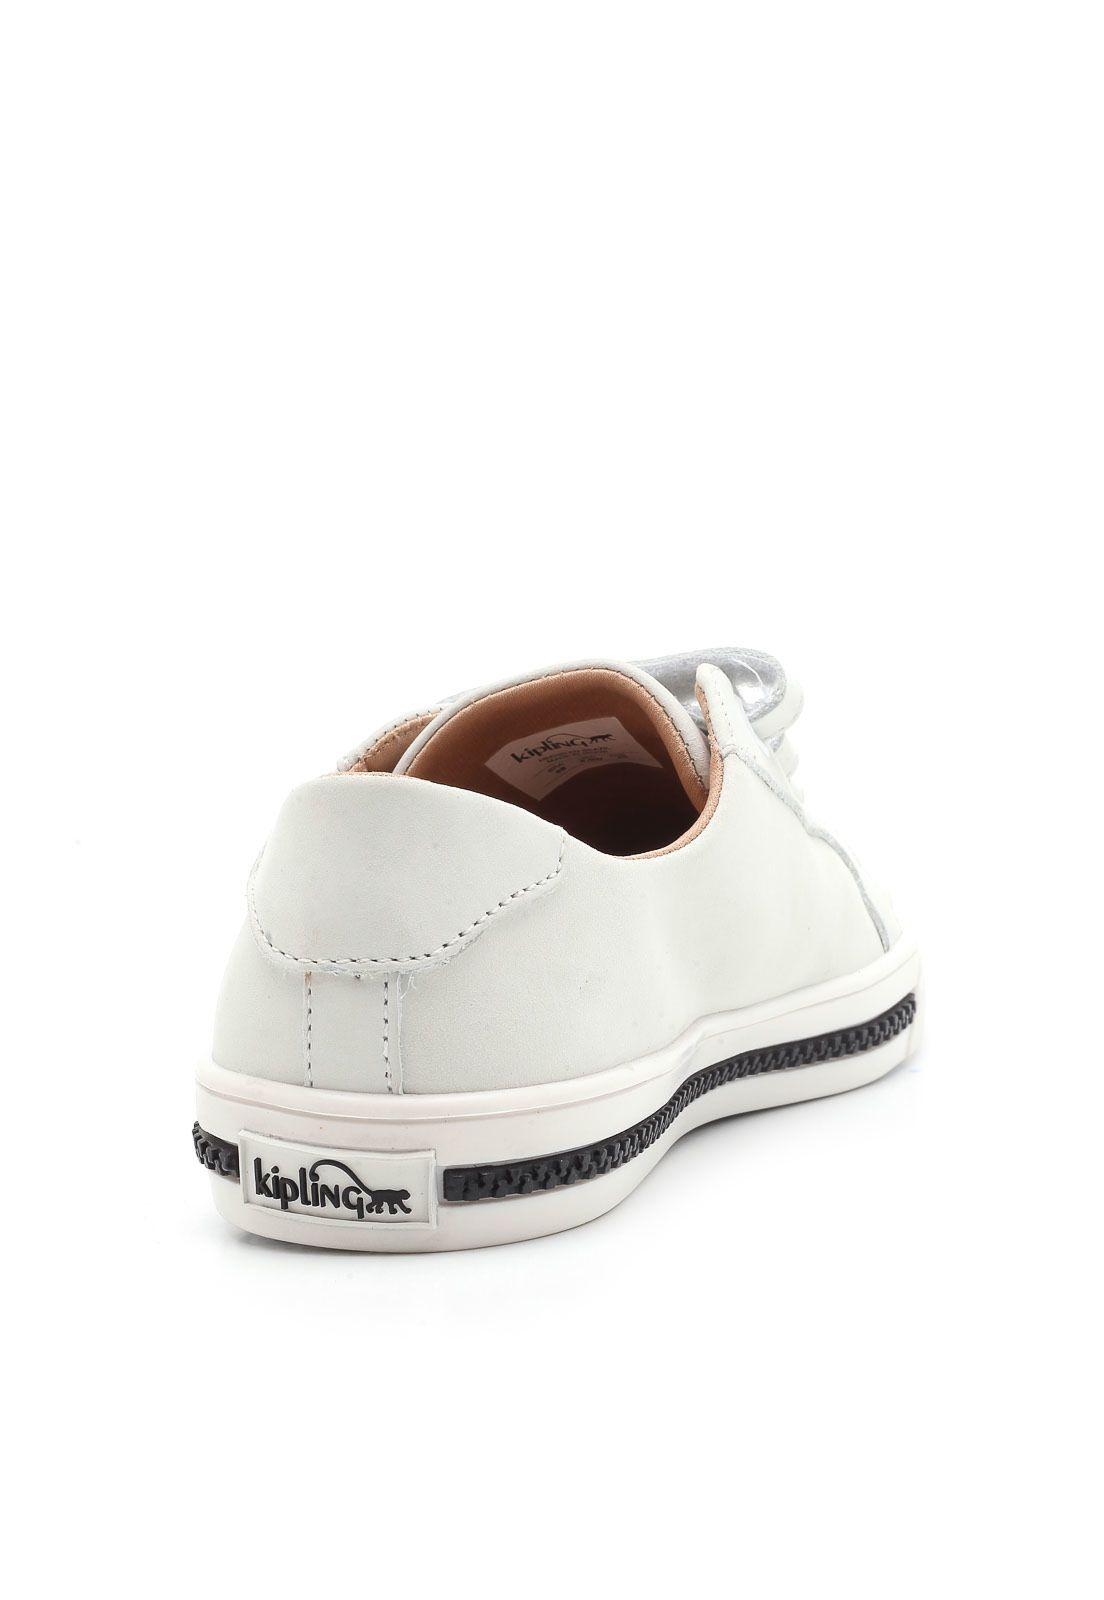 Tênis Kipling Couro com Velcro Branco 60336